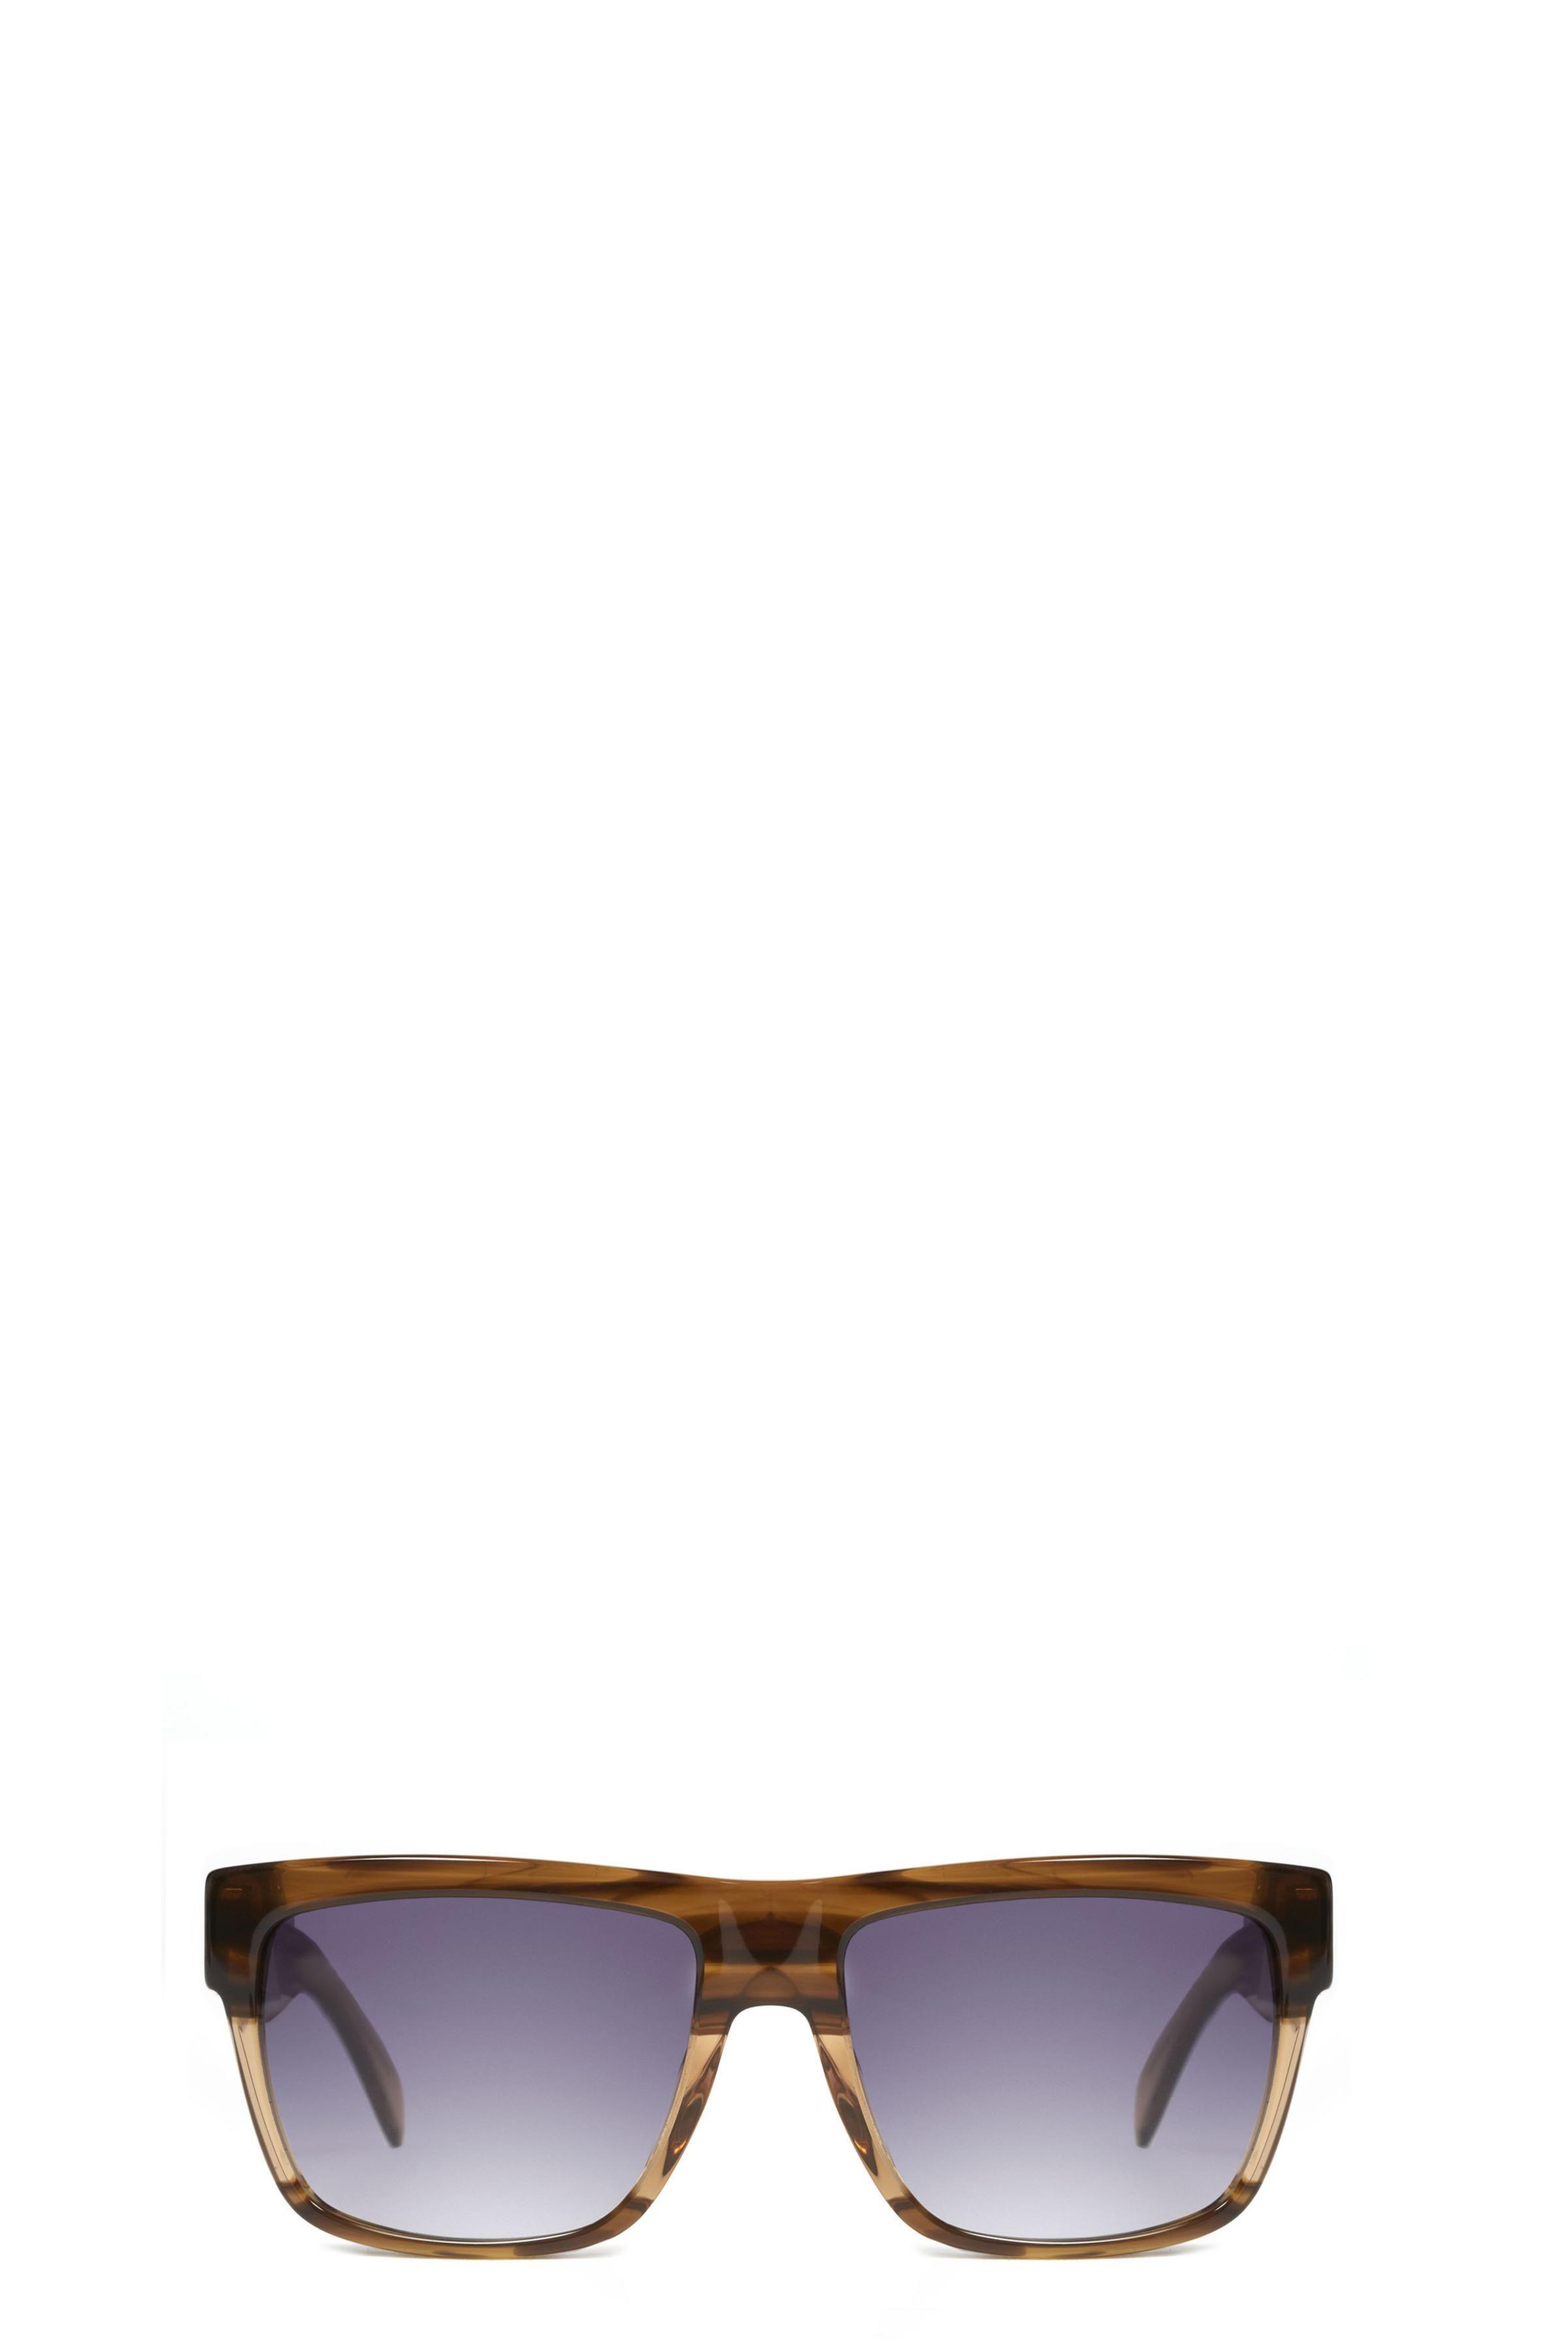 Marc by Marc Jacobs Colorblock Square Sunglasses feature plastic ...